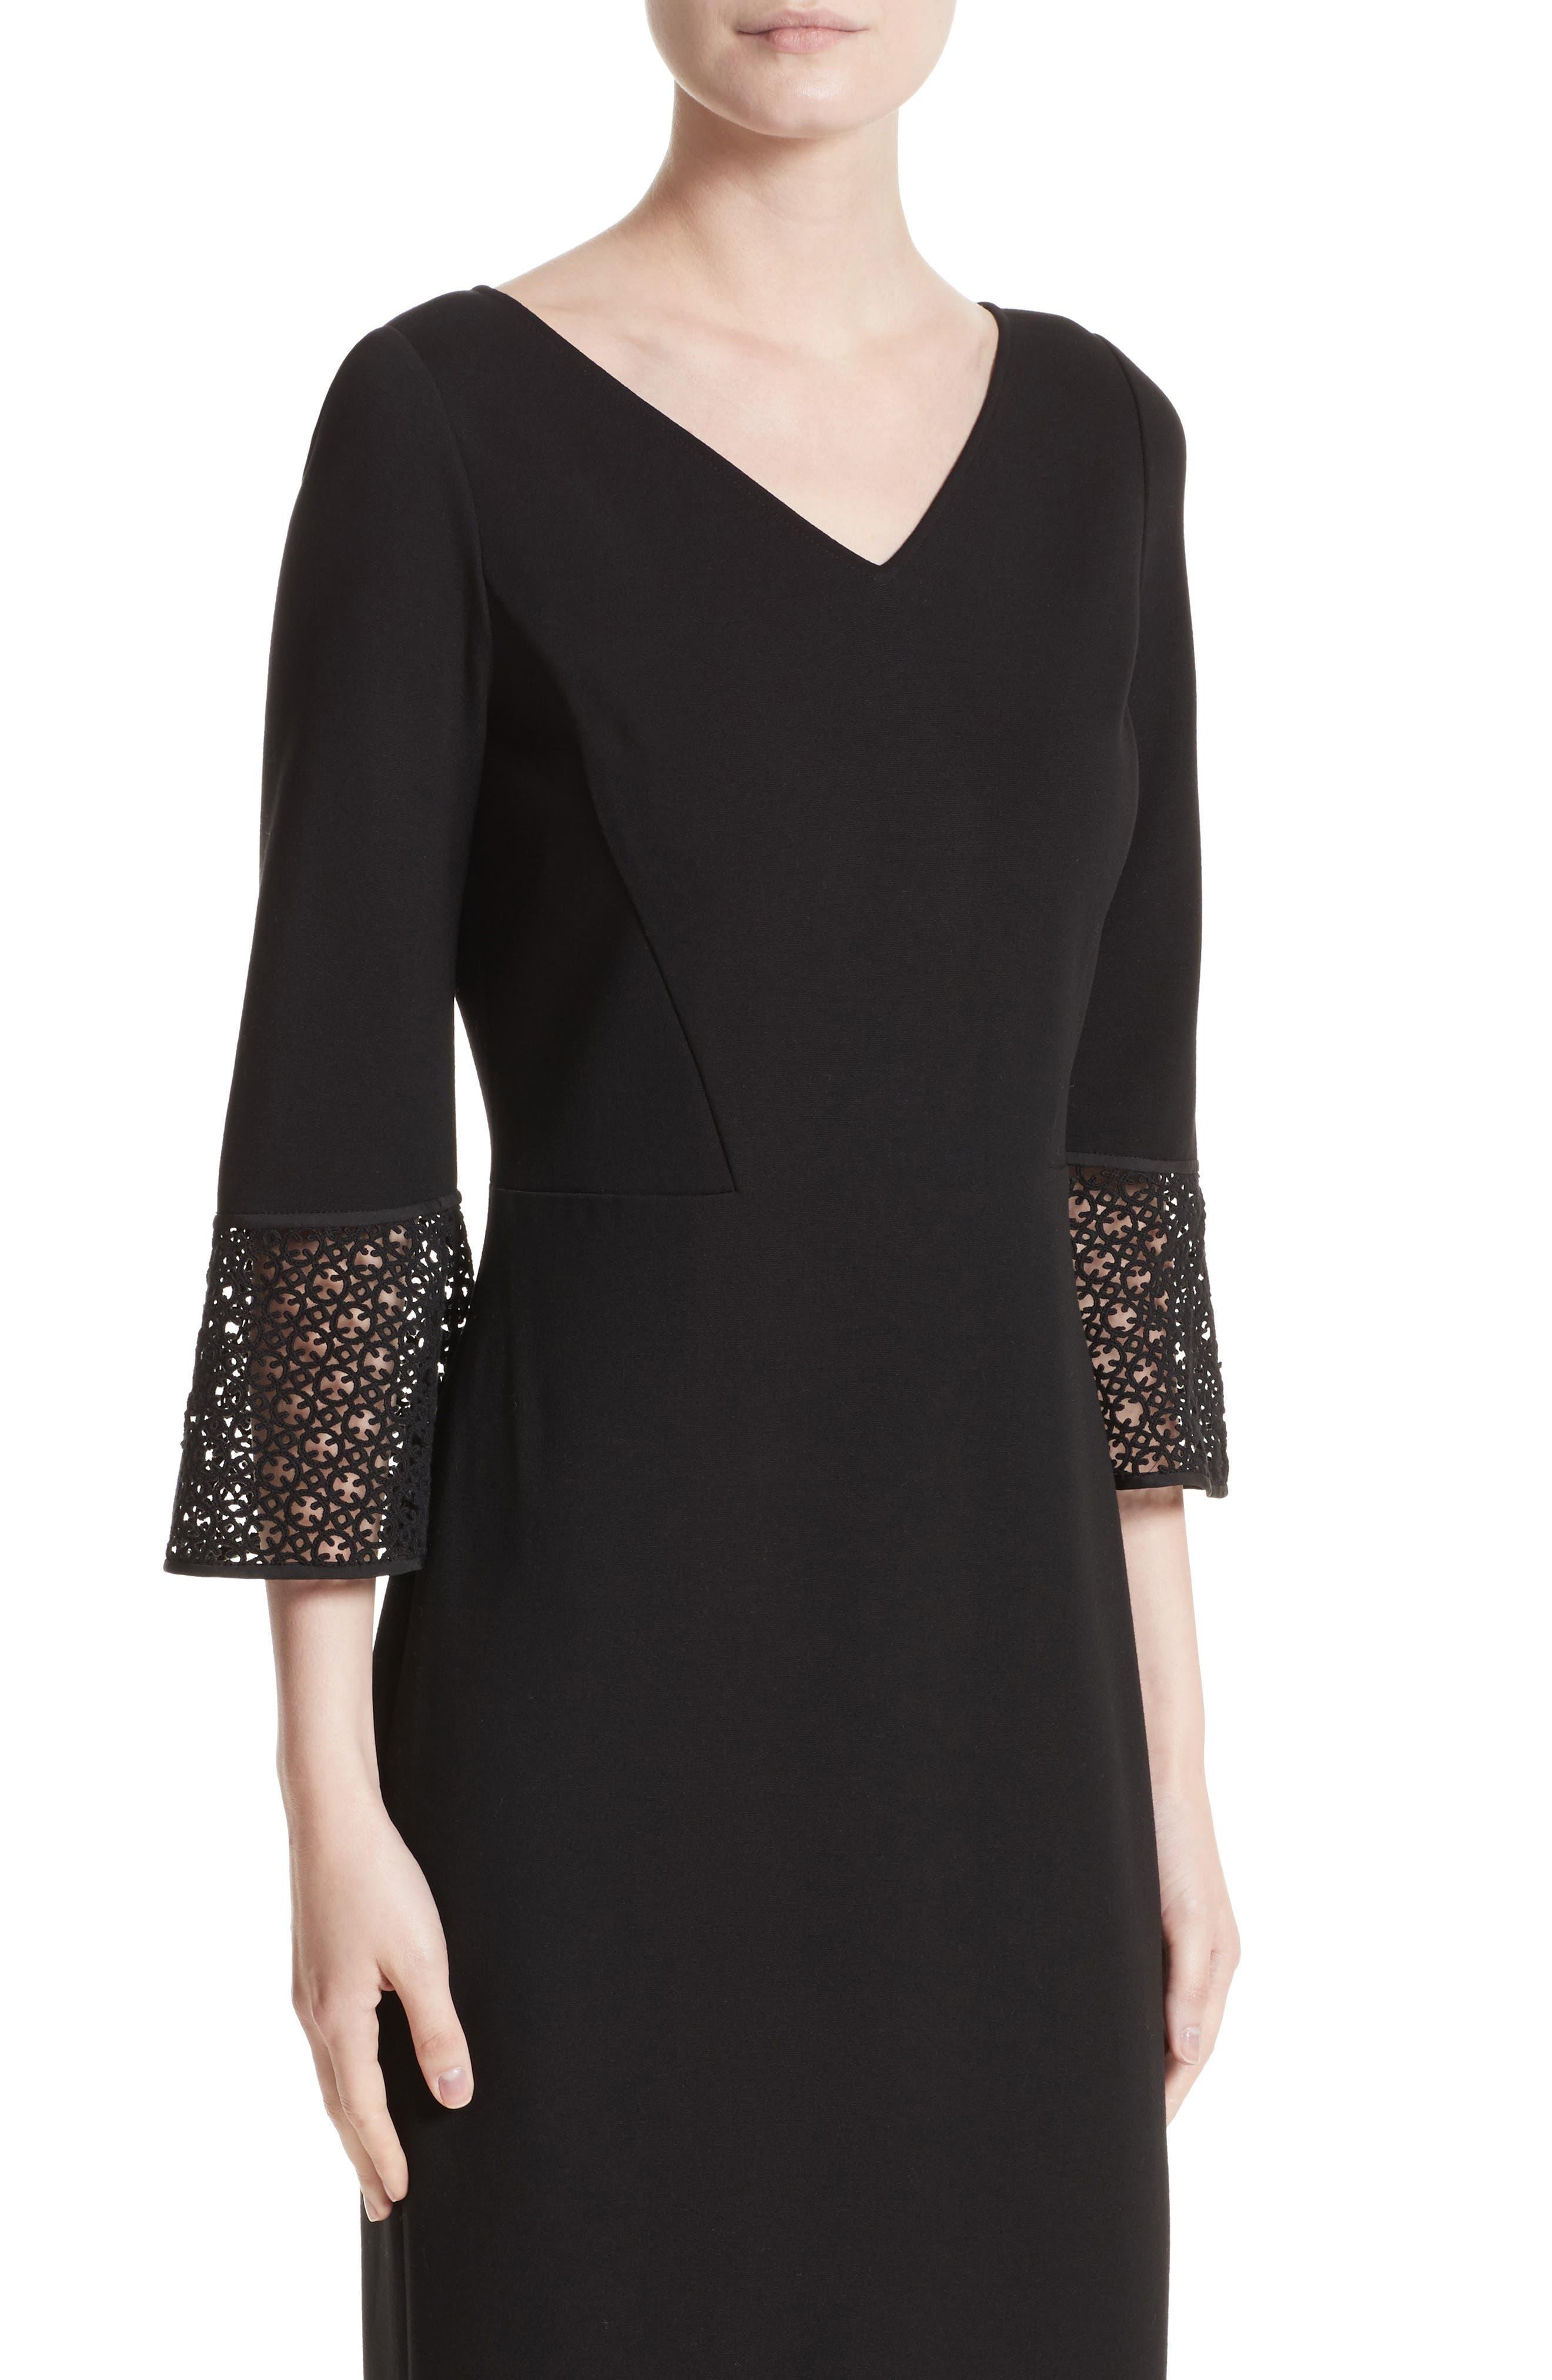 Lace Trim Sheath Dress,                             Alternate thumbnail 4, color,                             Black